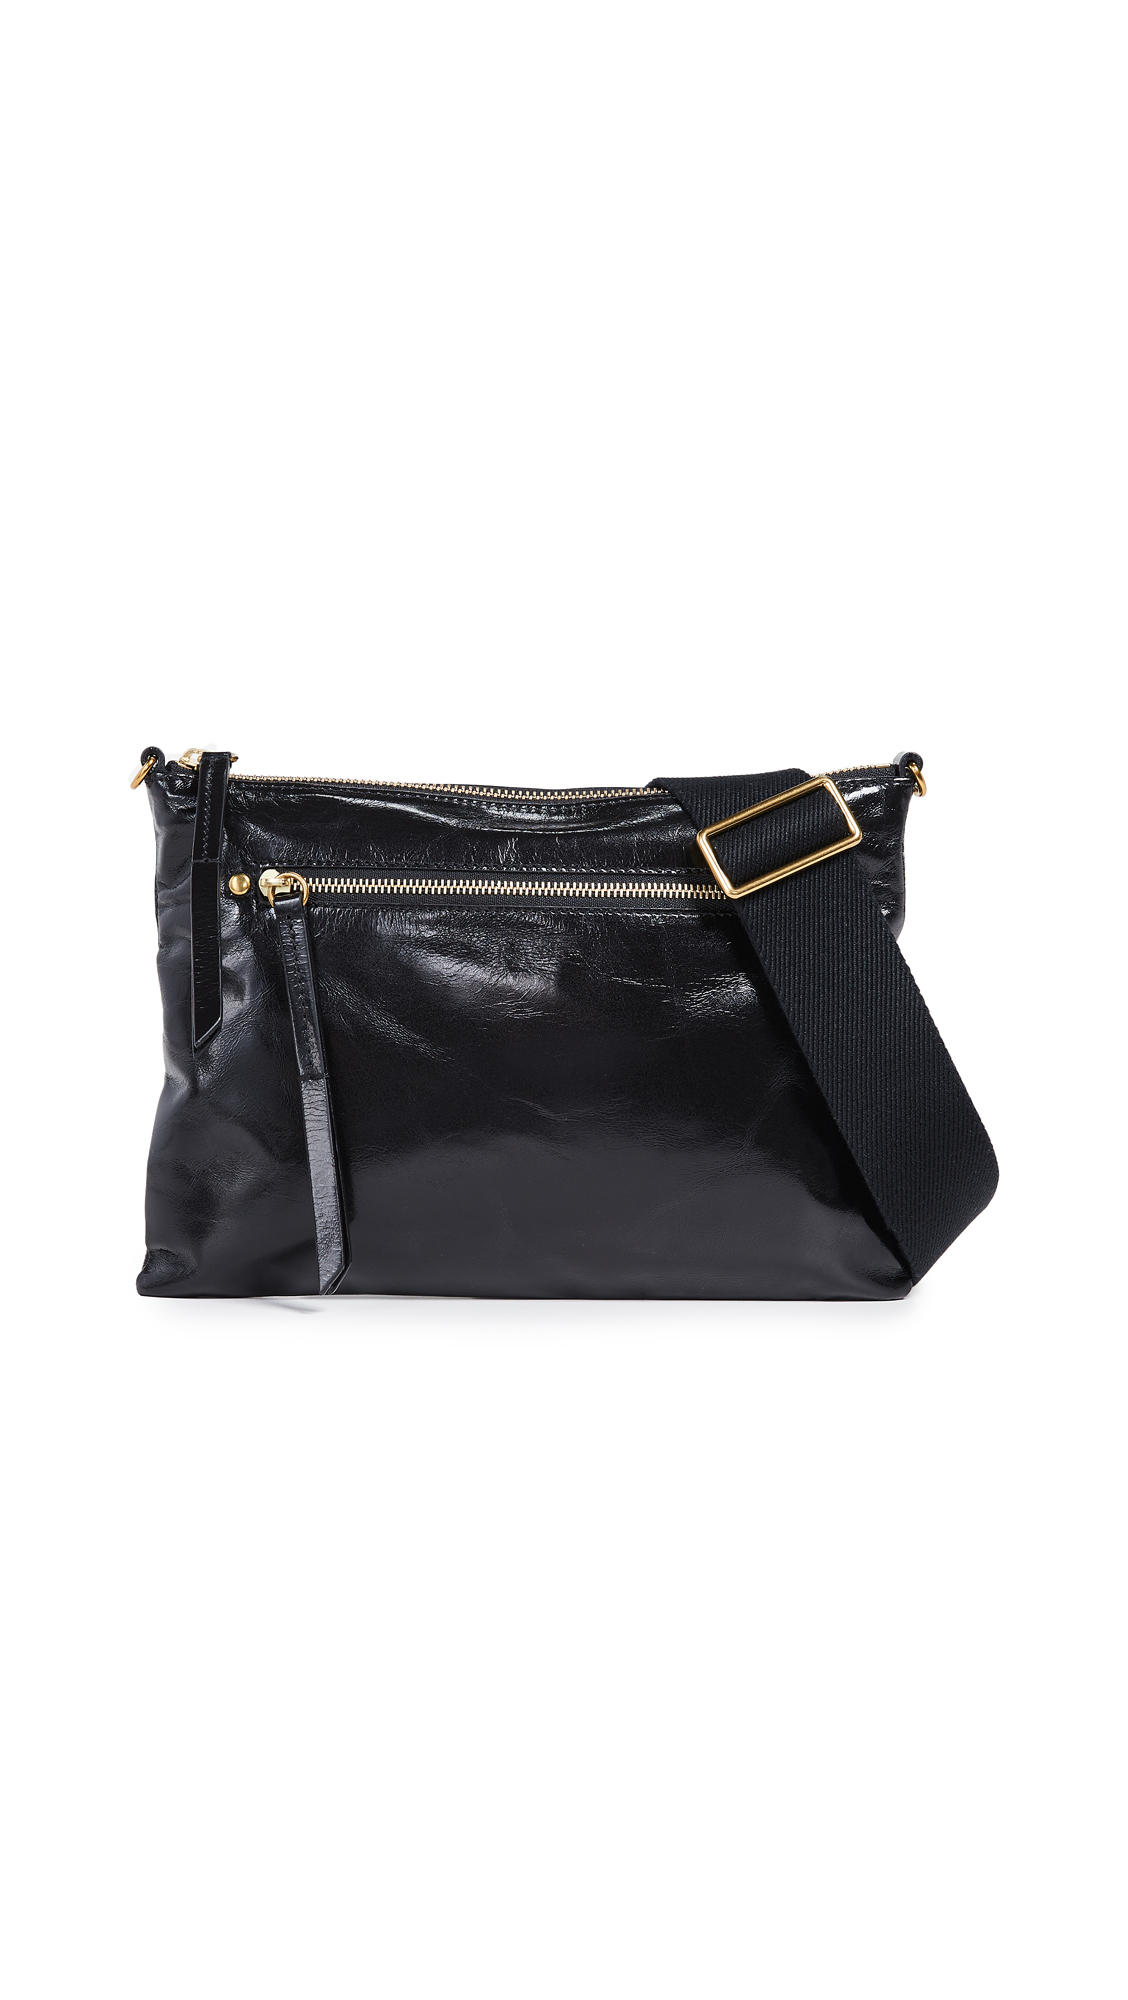 Isabel Marant Nessah Cross Body Bag In Black   ModeSens b5cbf5f28f